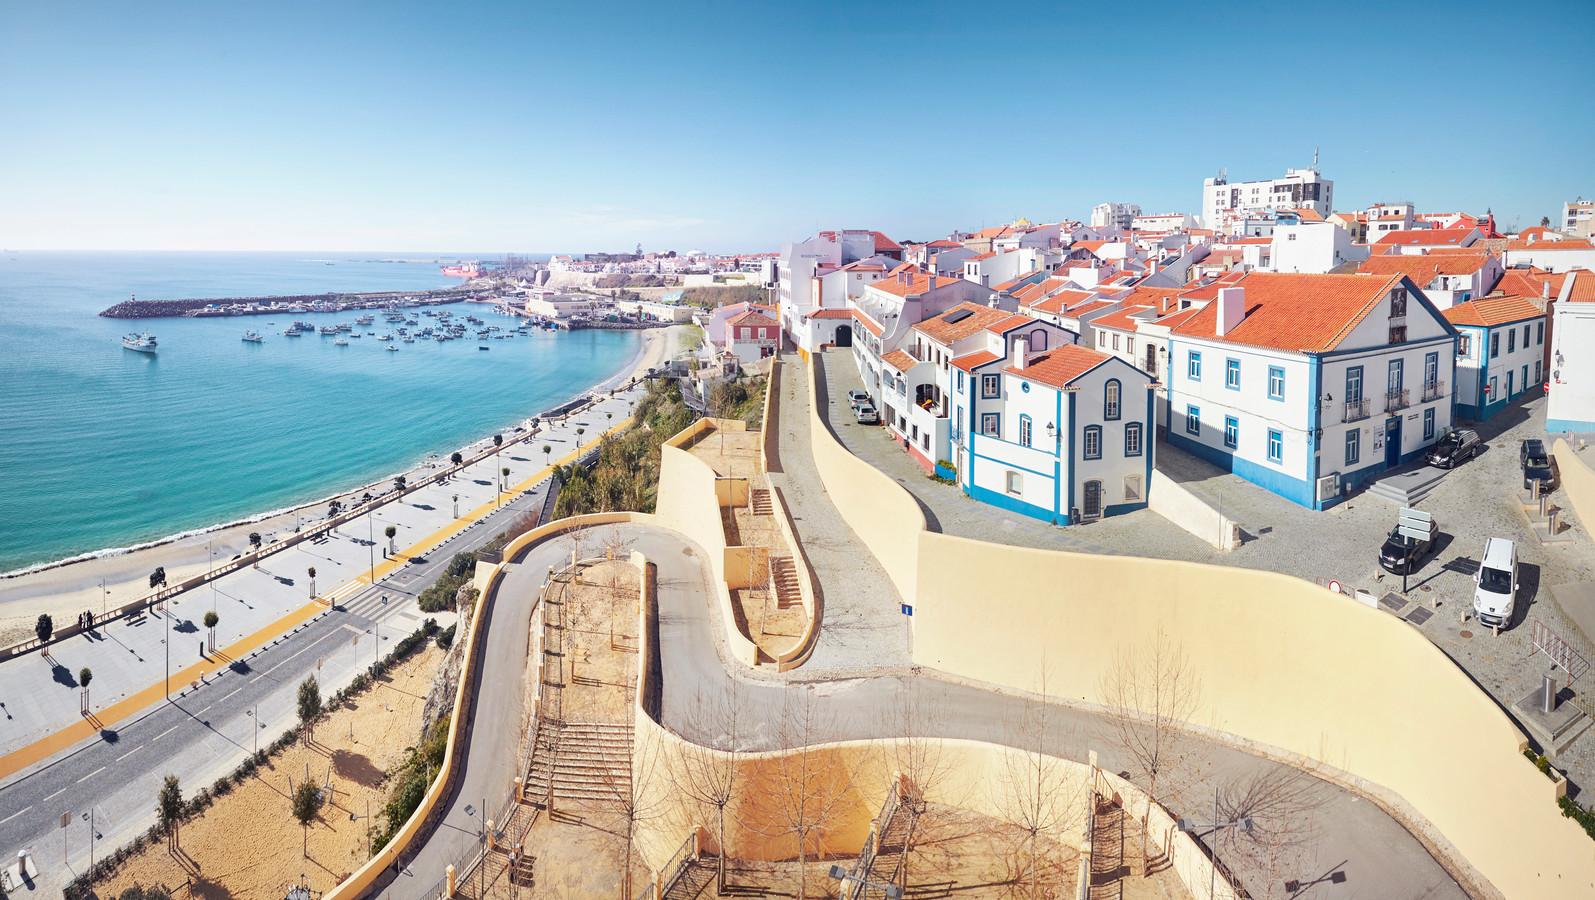 Het stadje Sines in de Portugese Alentejo-regio.